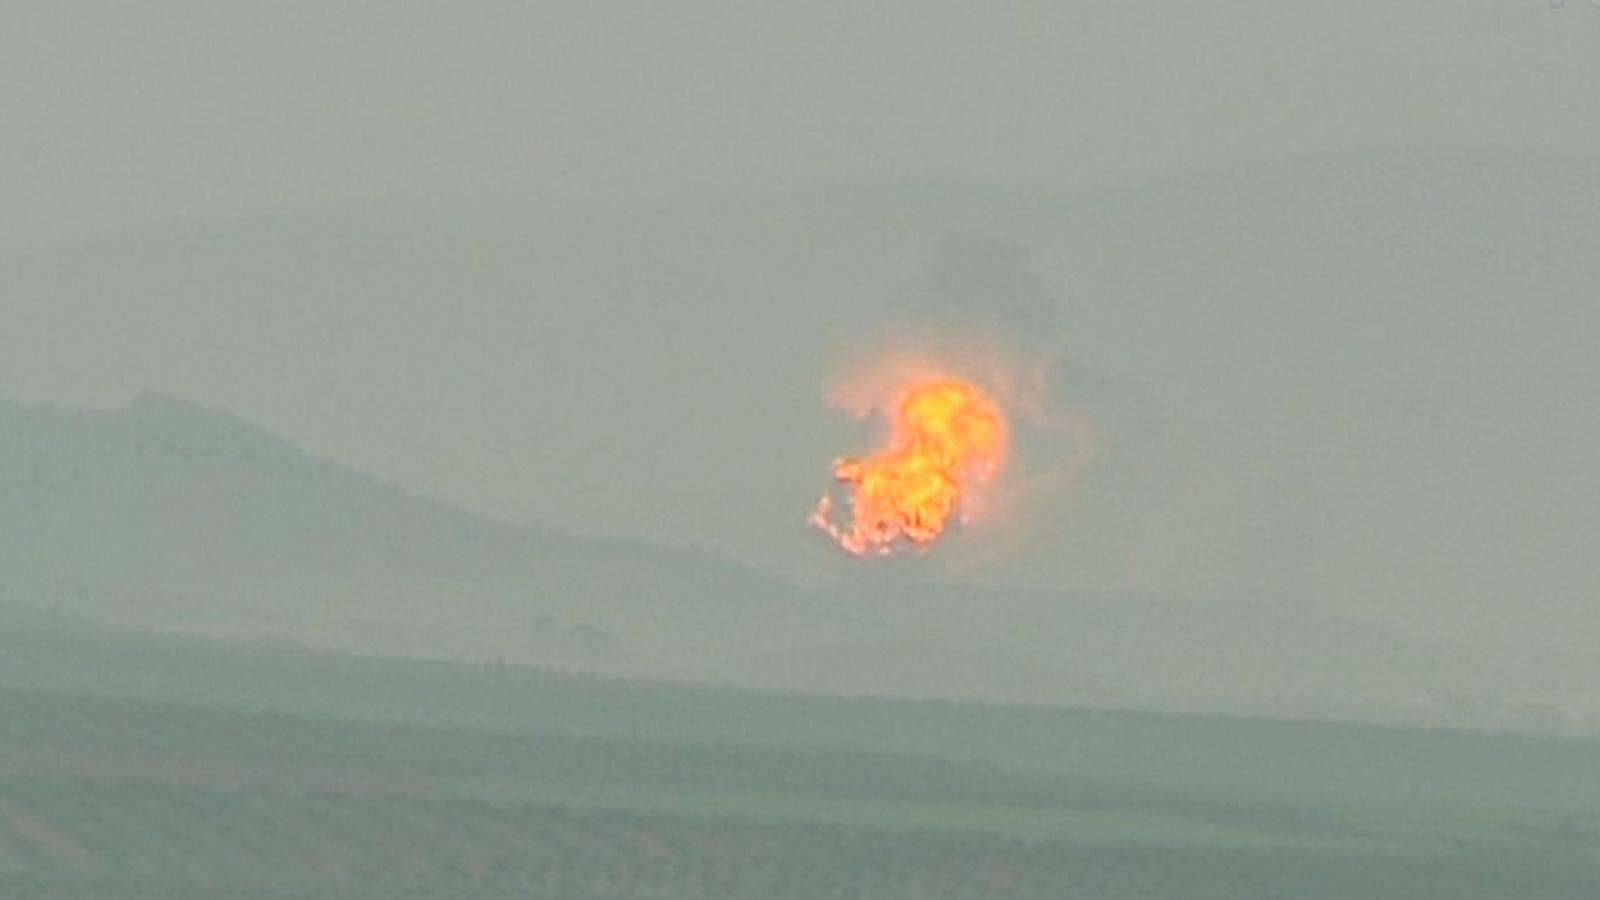 turkey-shells-us-backed-kurdish-militia-in-syrias-afrin